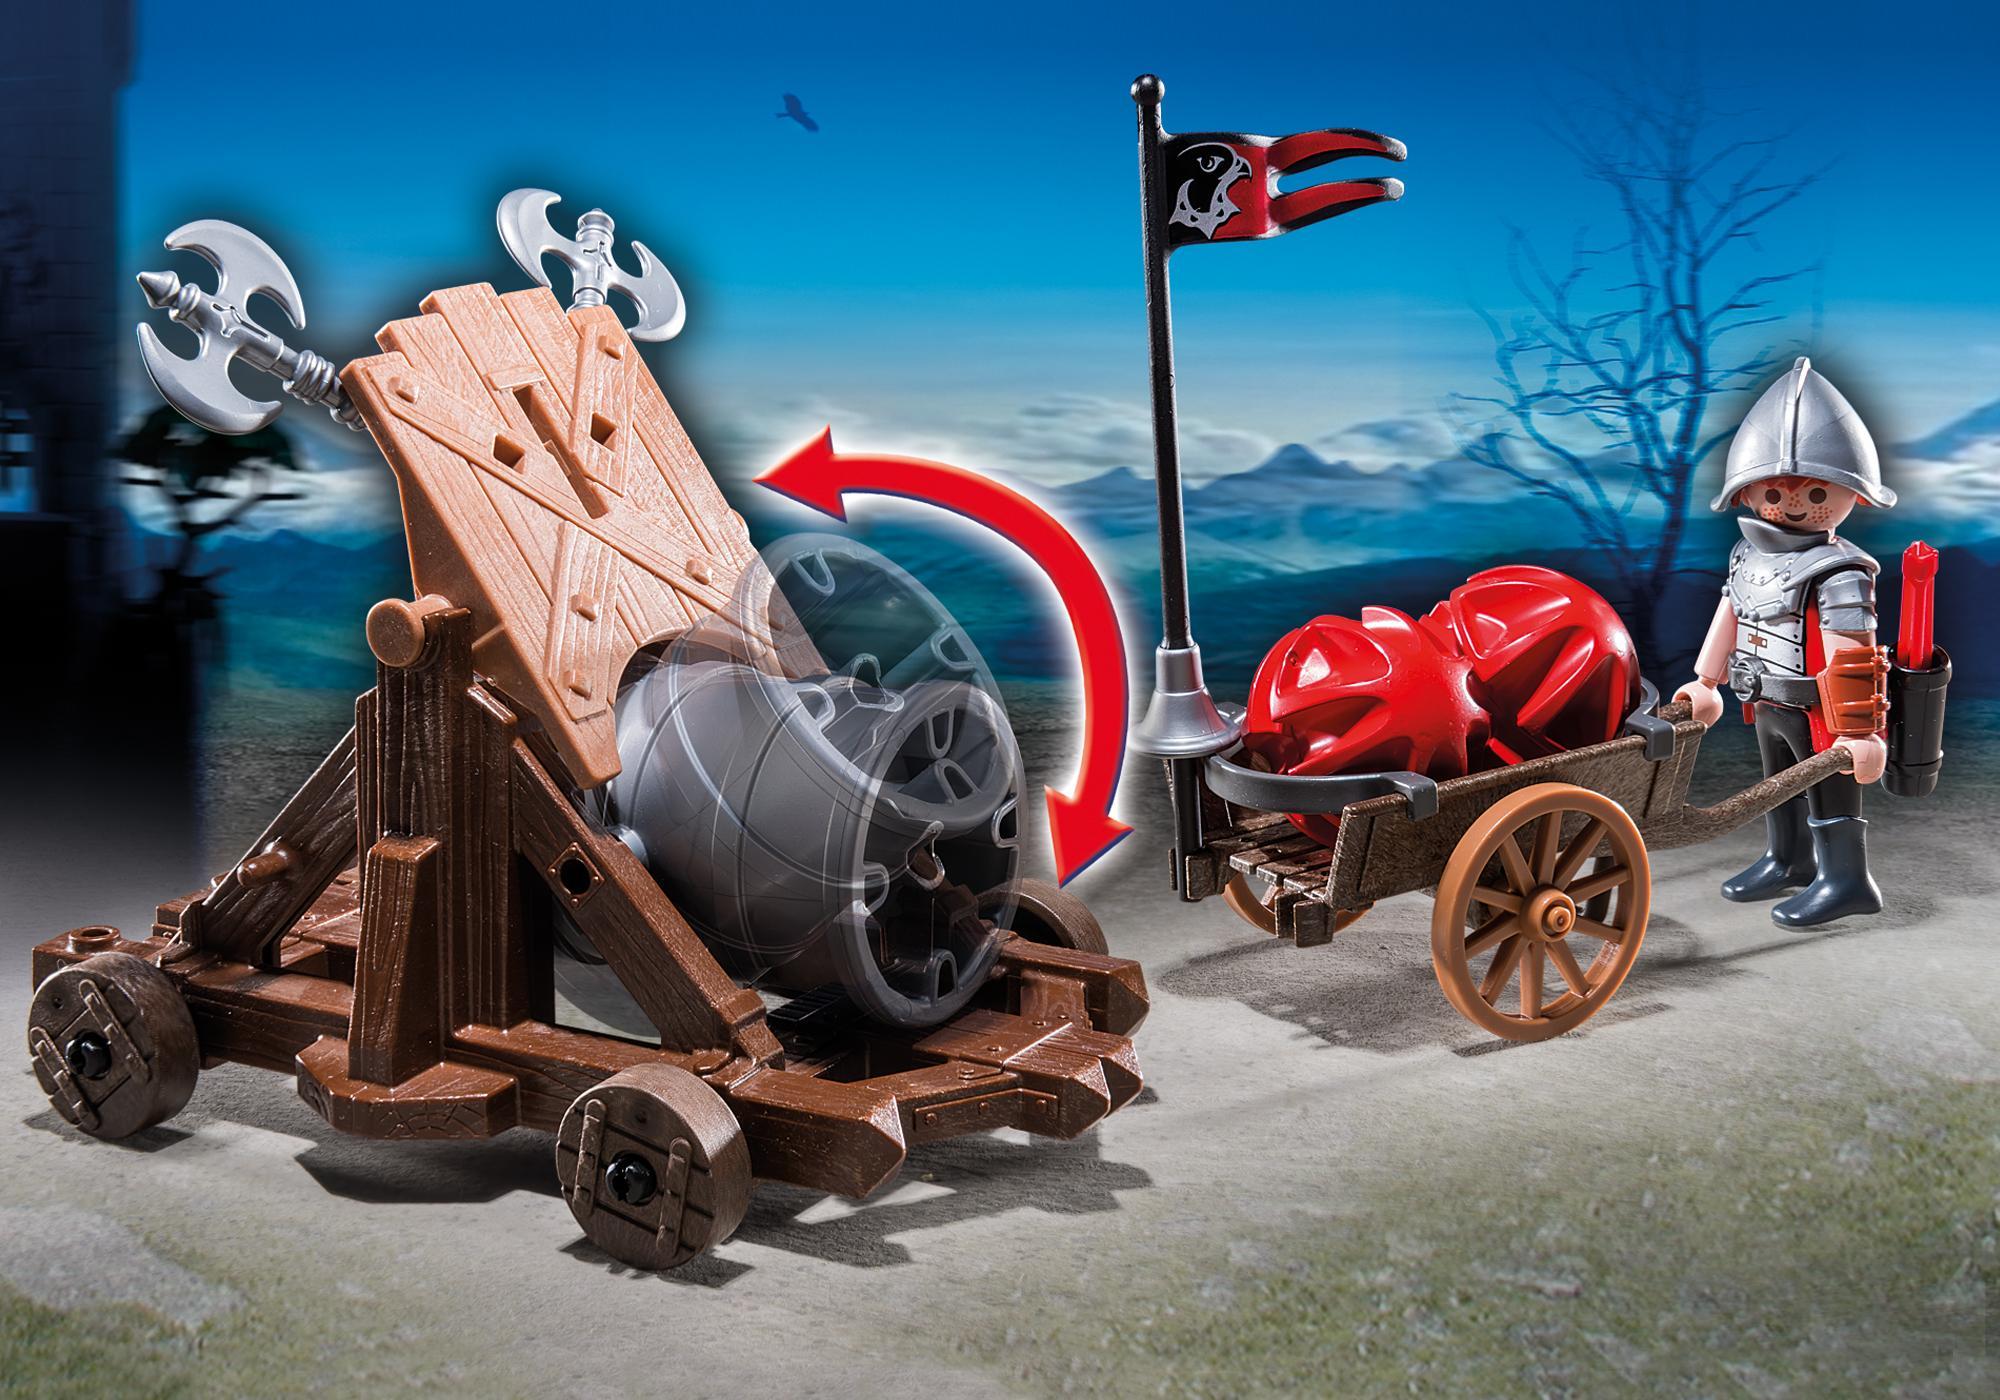 http://media.playmobil.com/i/playmobil/6038_product_extra1/Caballeros del Halcón con Cañón